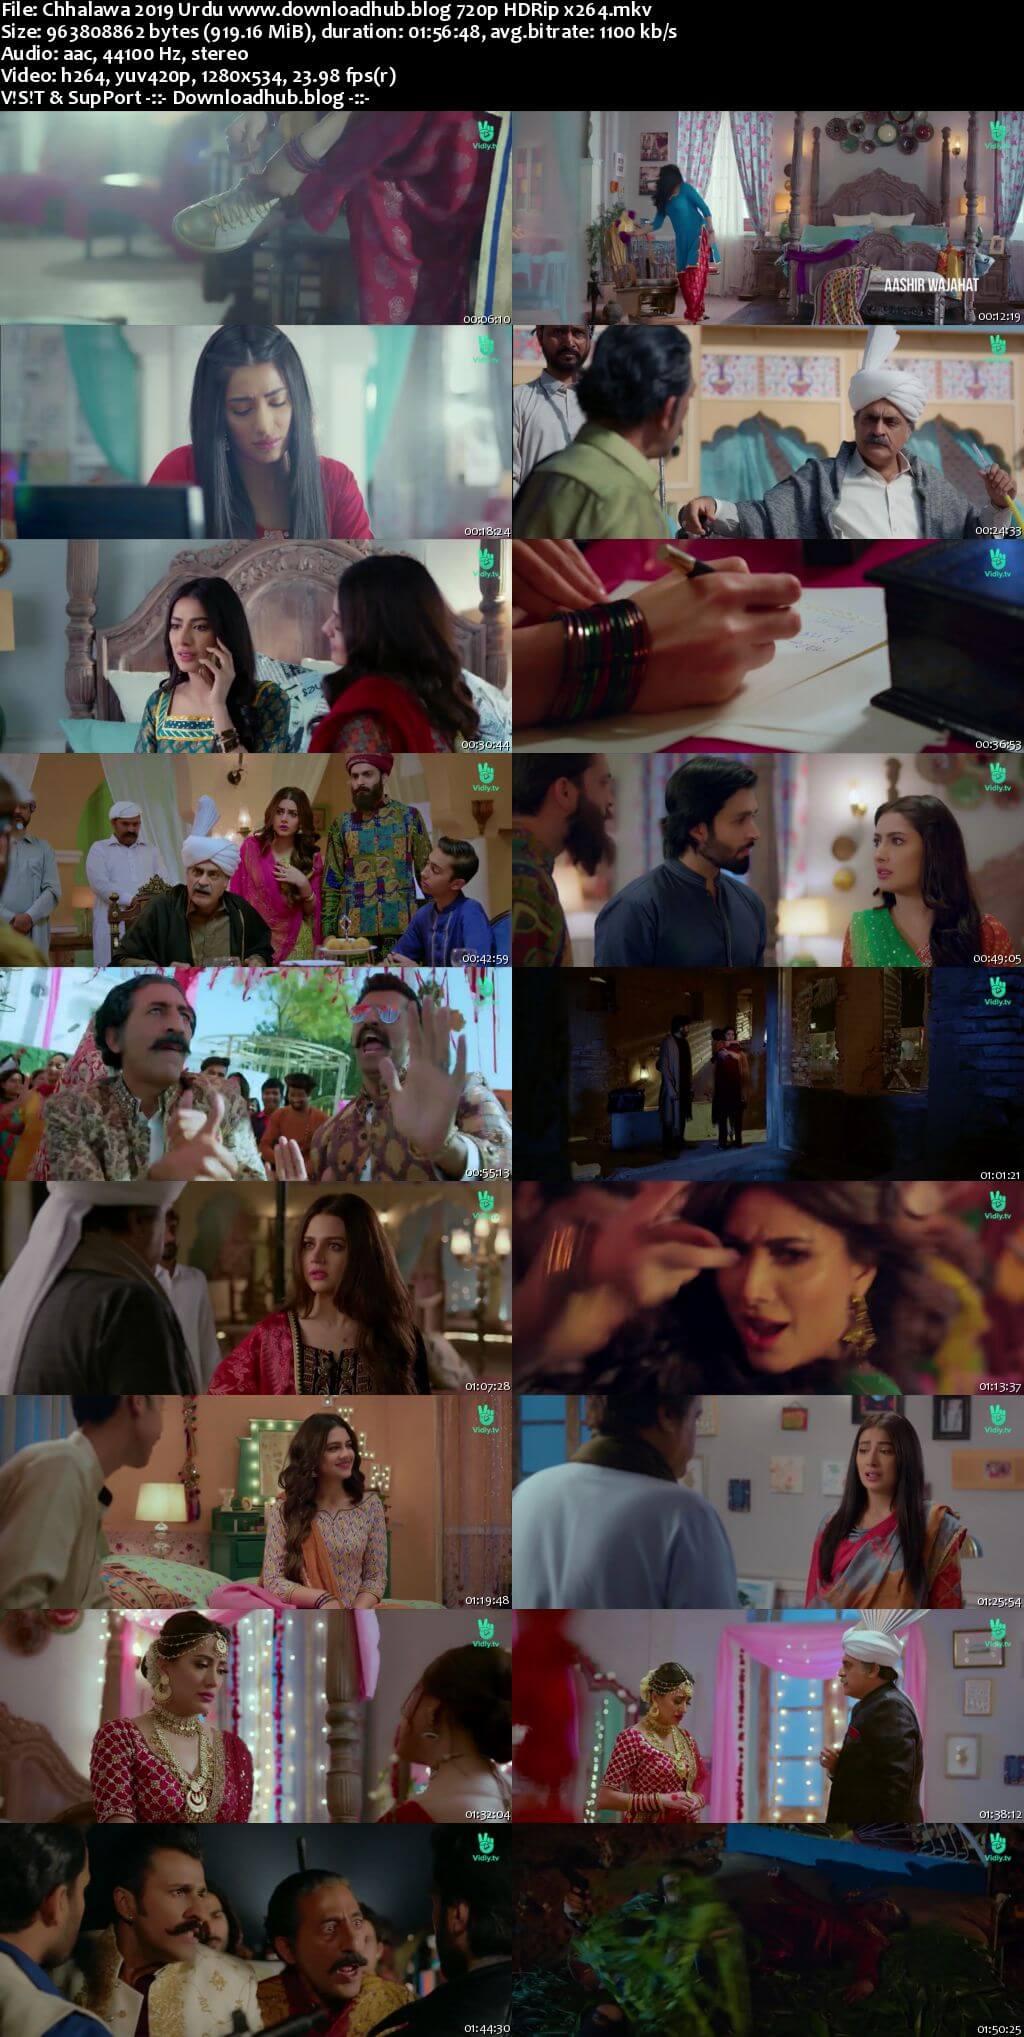 Chhalawa 2019 Urdu 720p HDRip x264